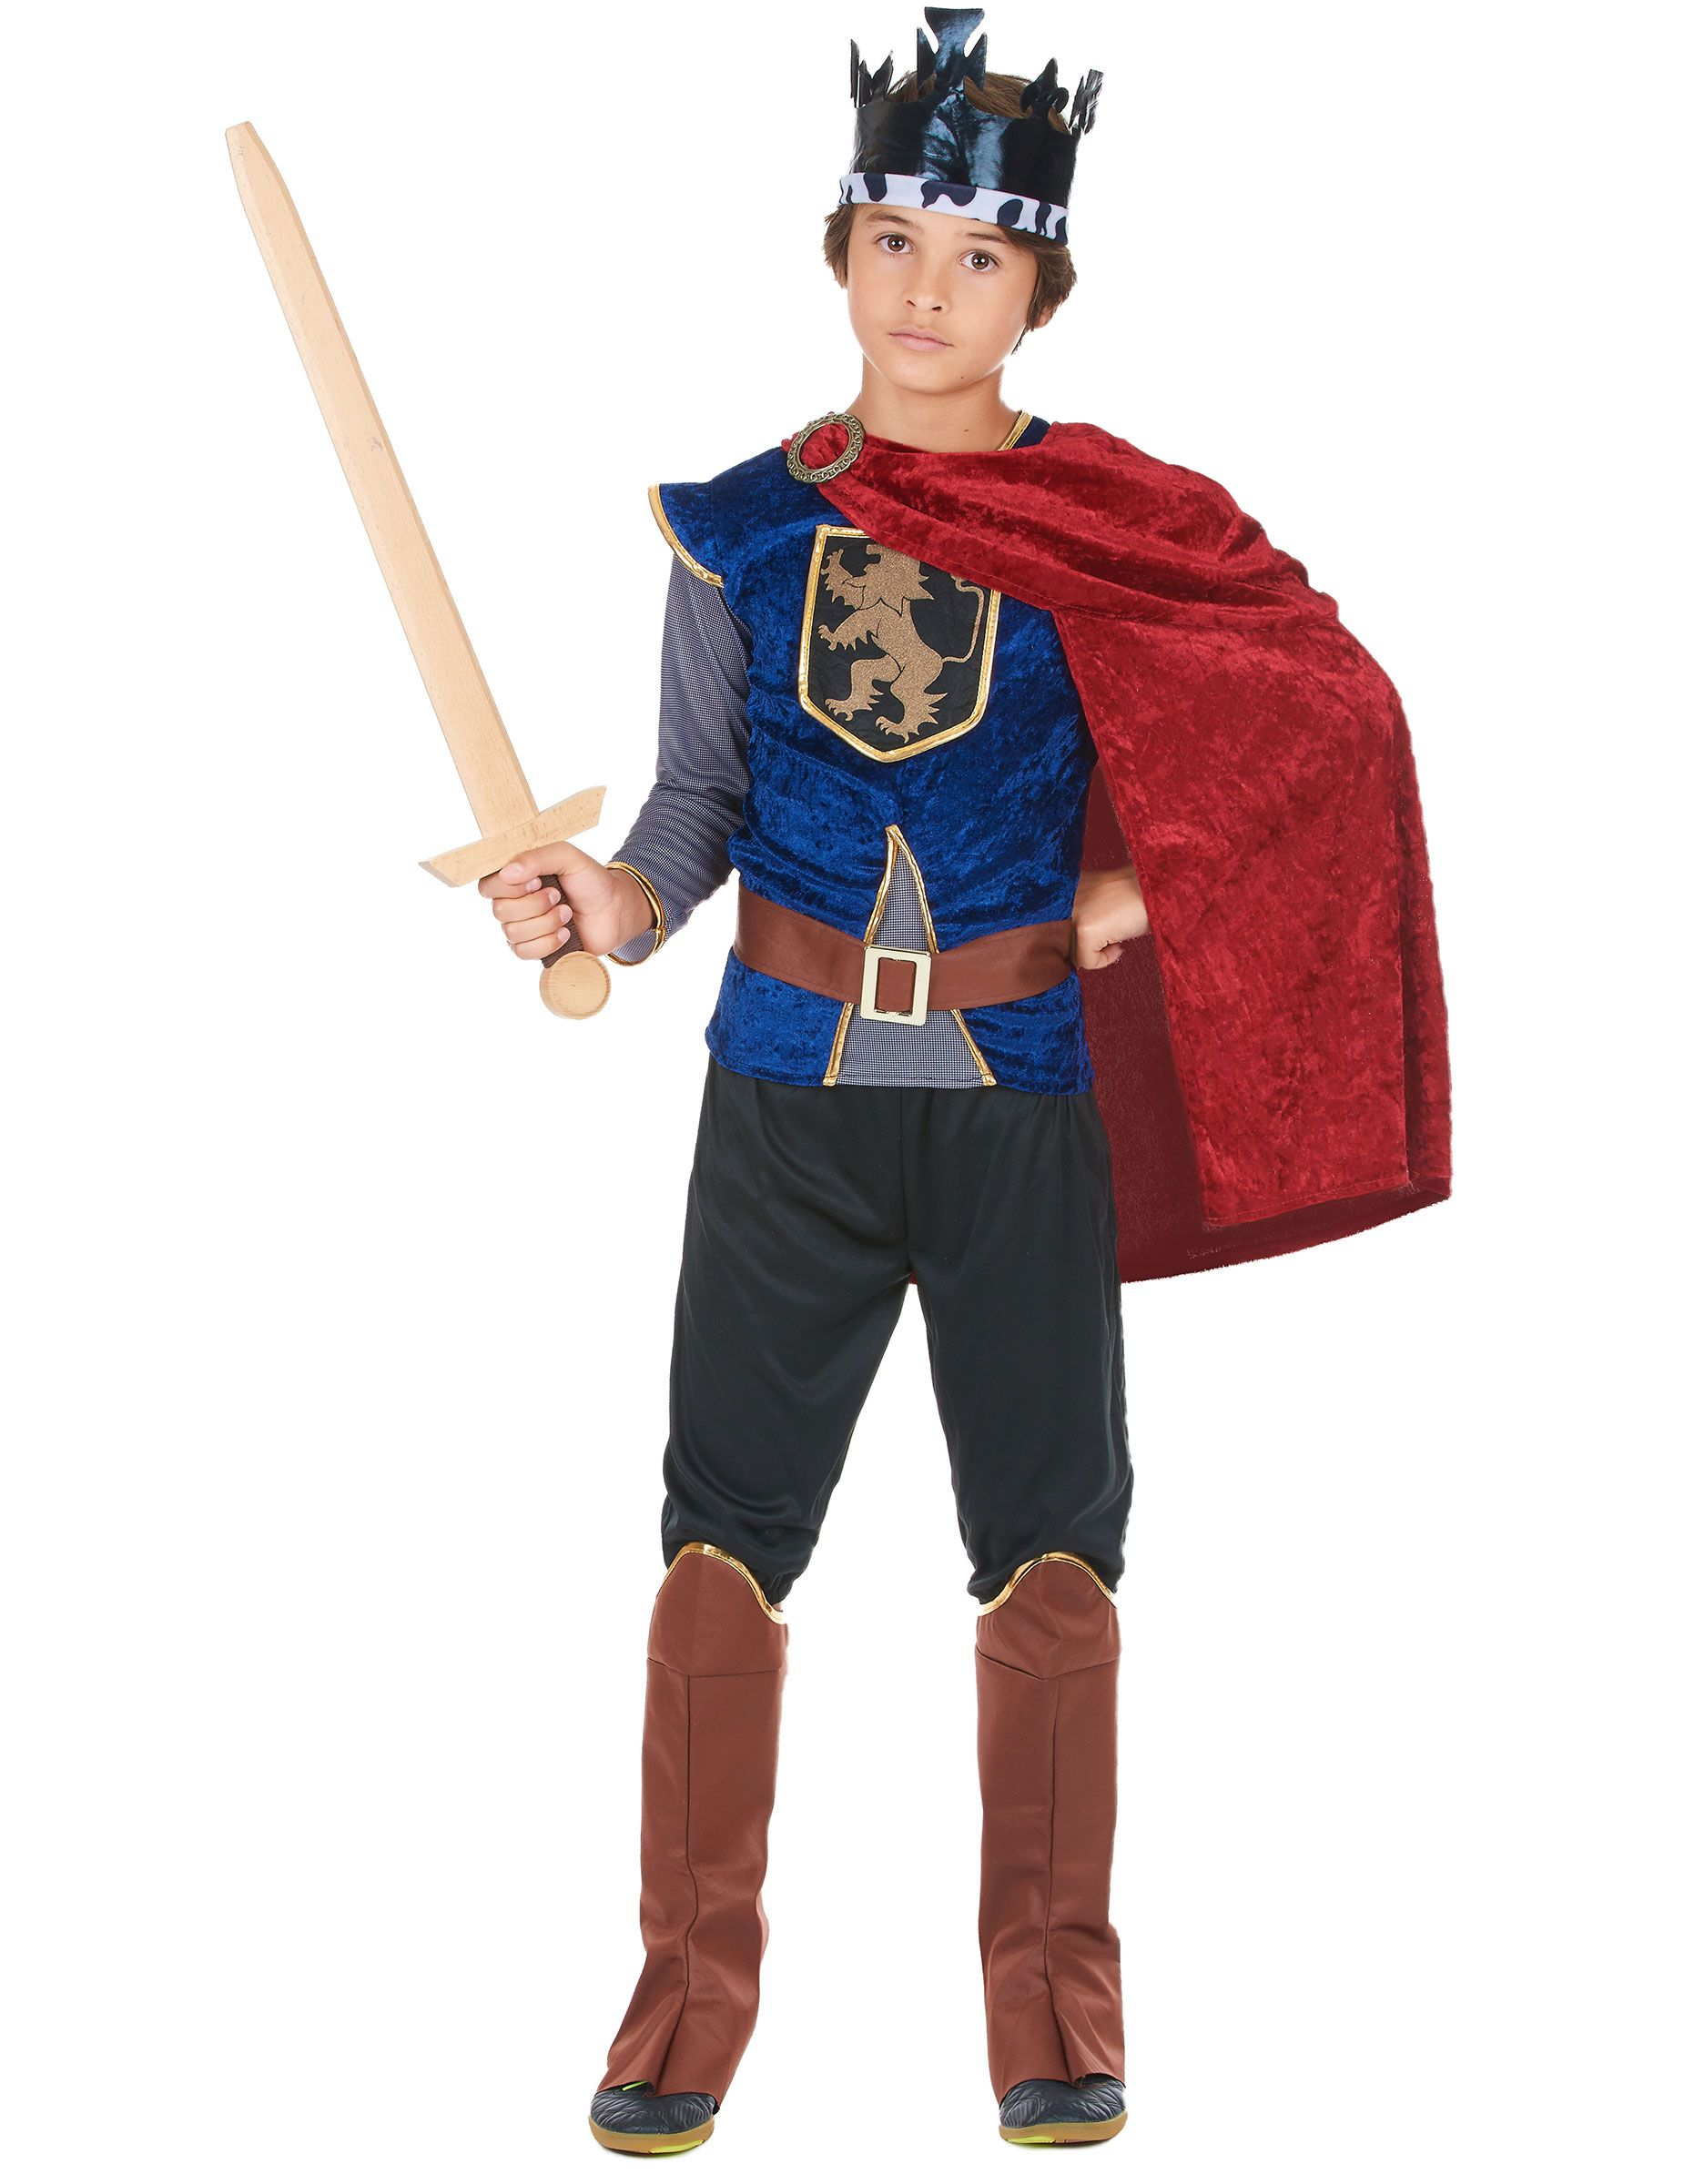 3d7c31b05 Disfraz de rey medieval infantil | disfraz | Disfraz de rey, Disfraz ...